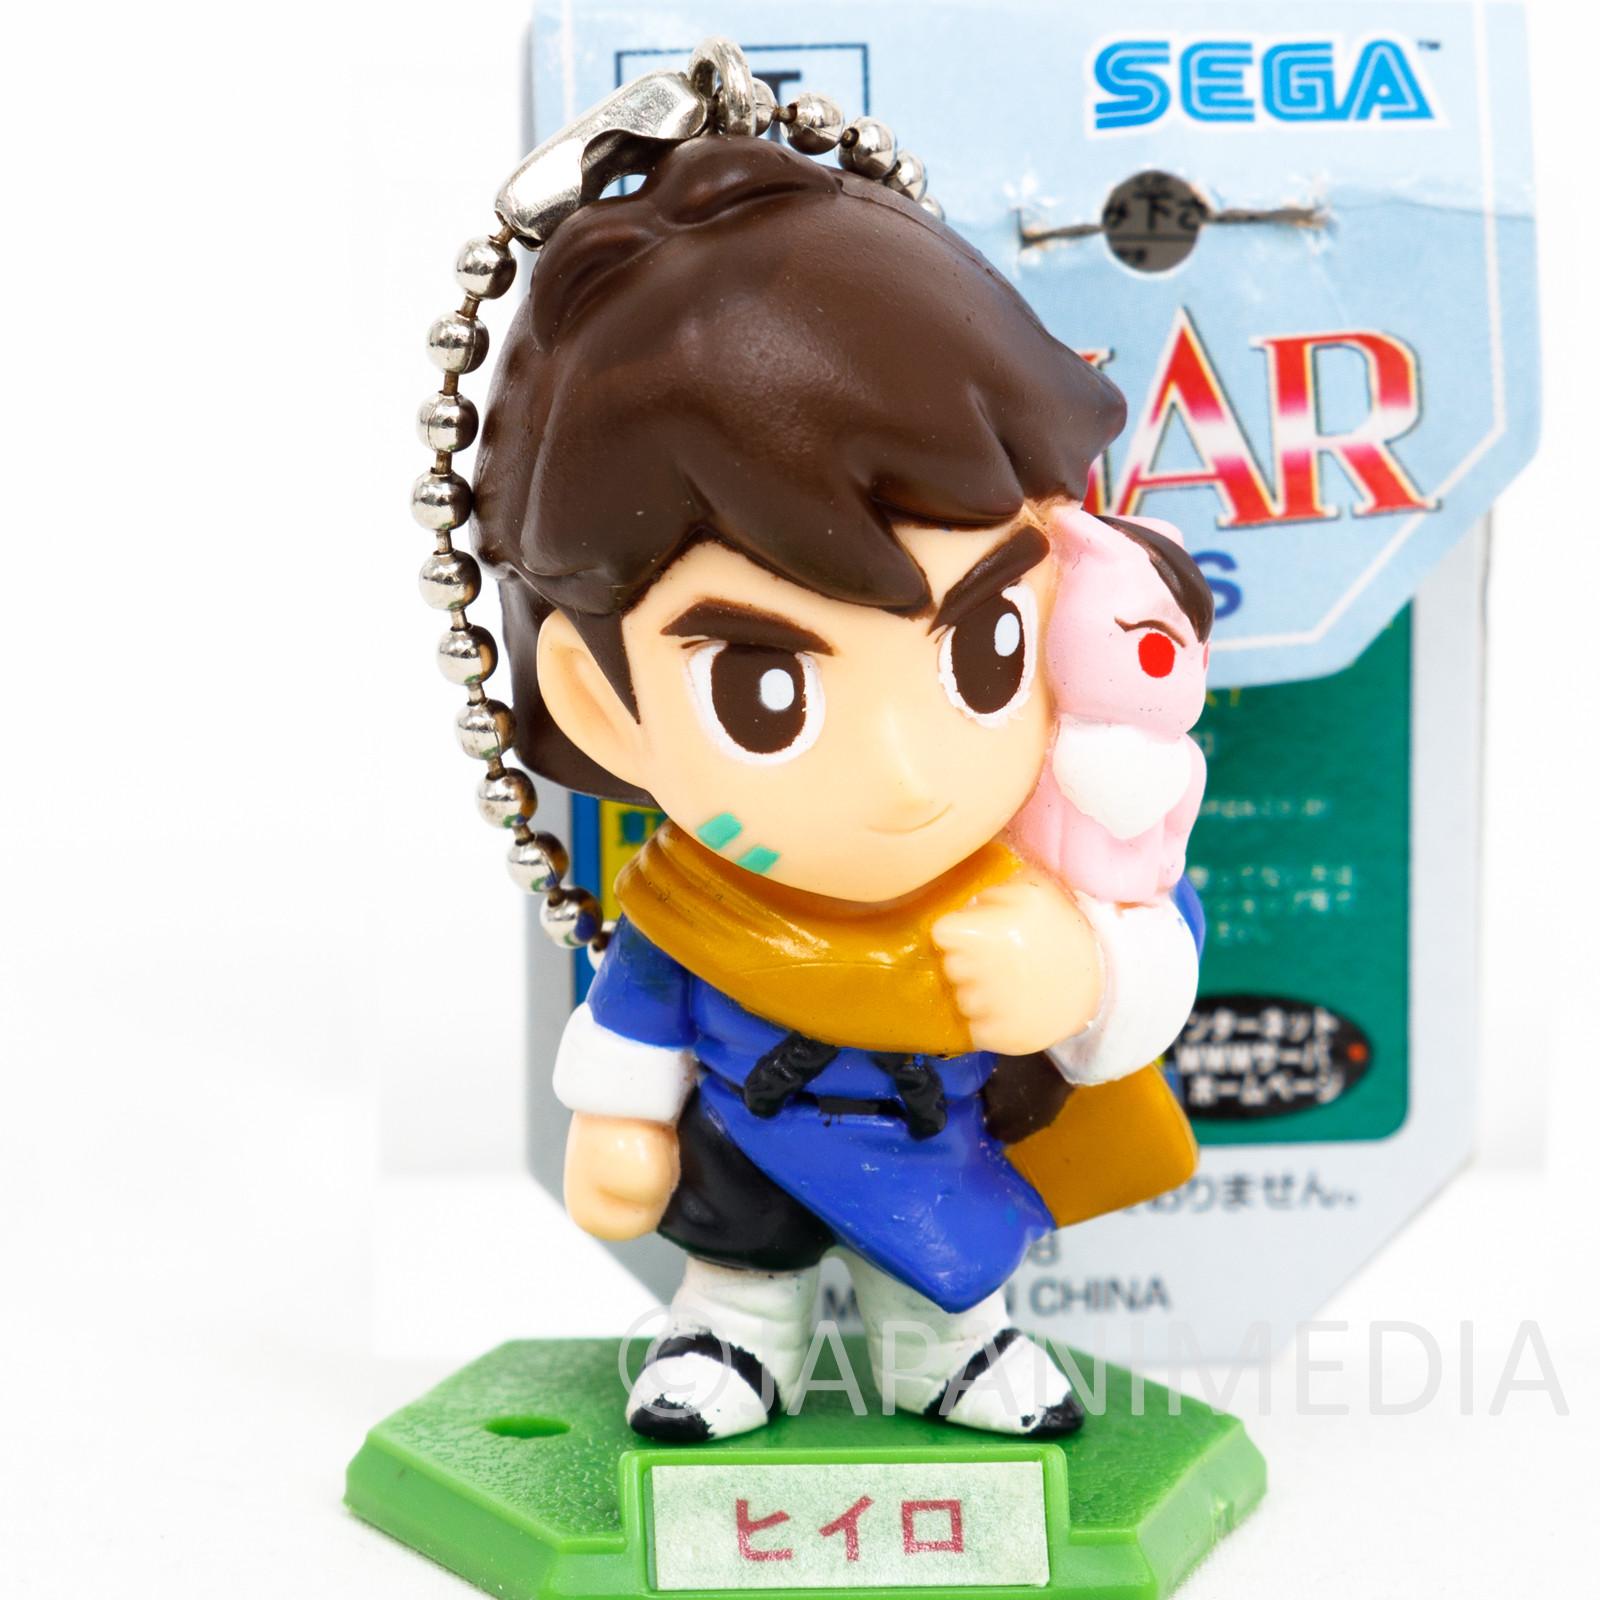 RARE!! LUNAR Series Character Figure Ballchain Hiro SEGA GAME